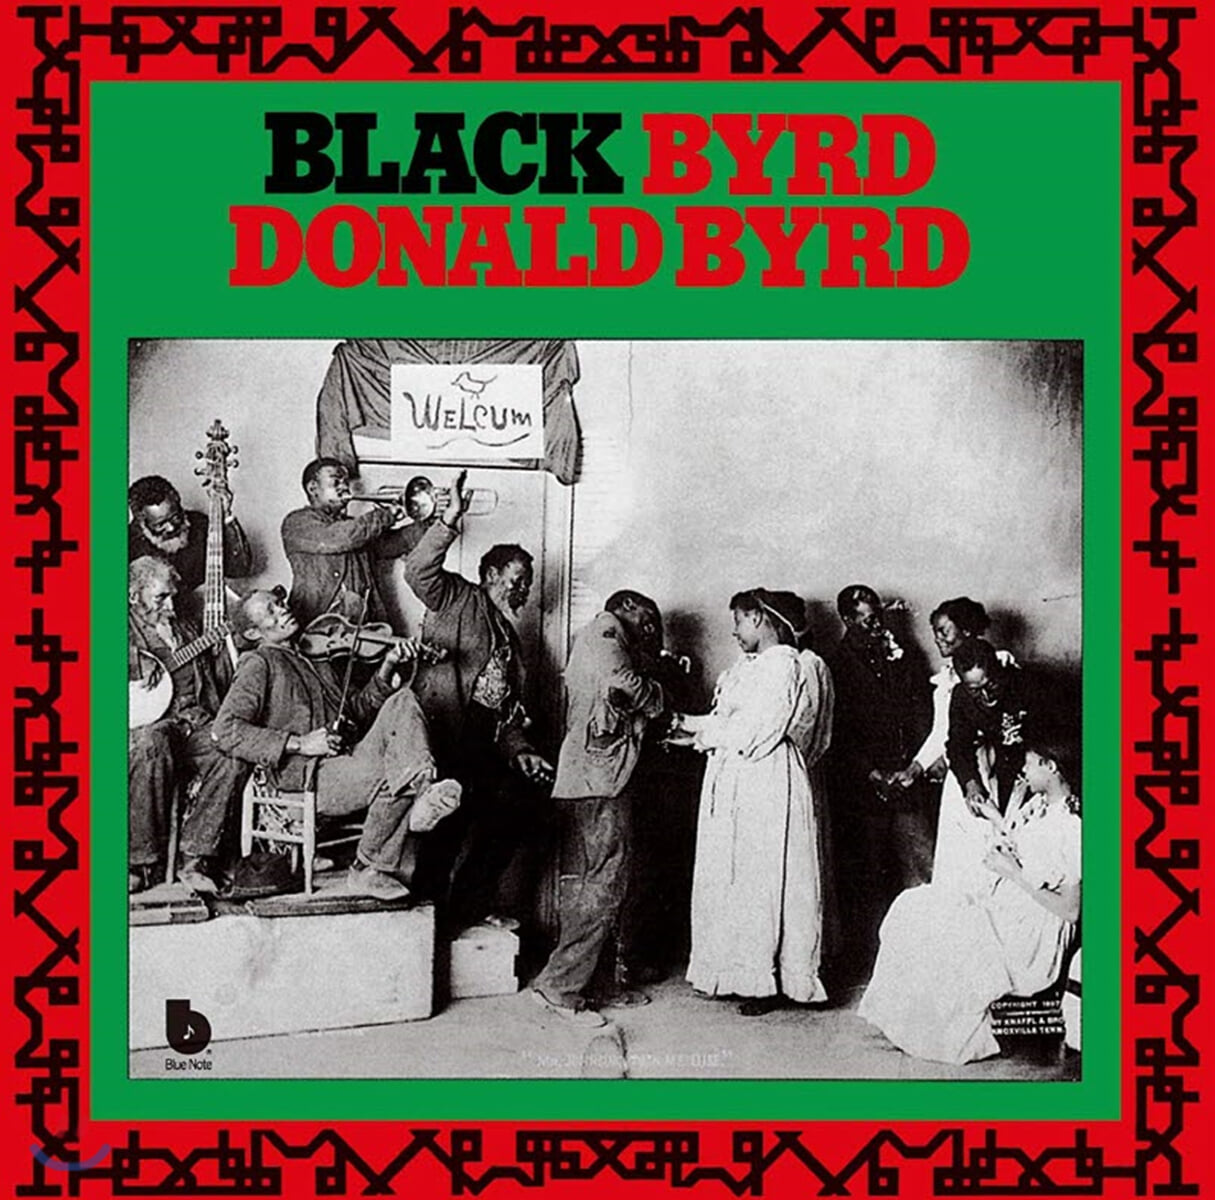 Donald Byrd (도날드 버드) - Black Byrd